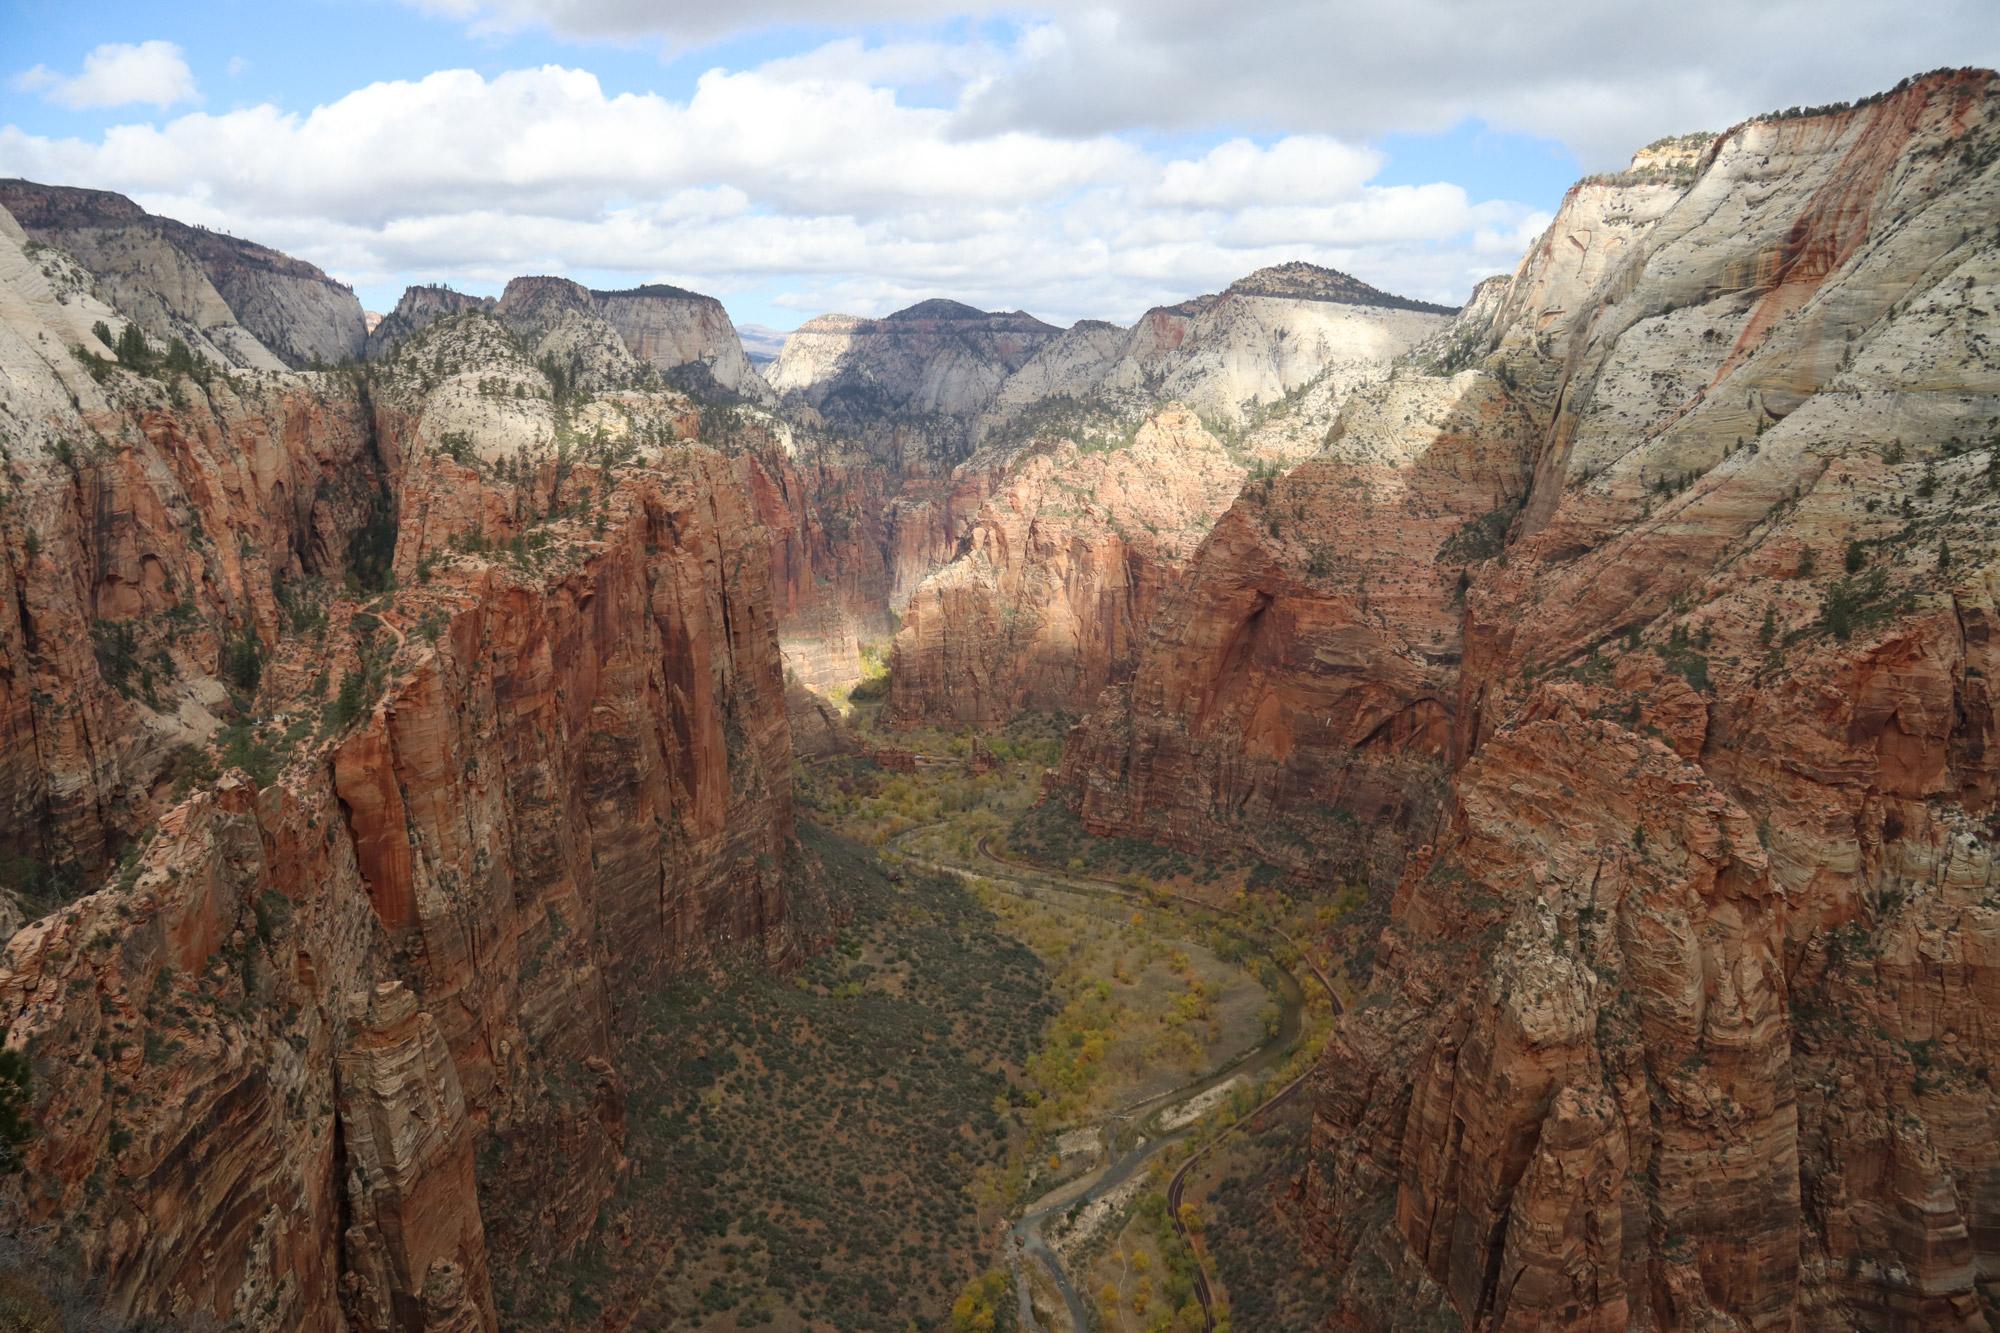 Amerika dag 15 - Zion National Park - Angels Landing Trail